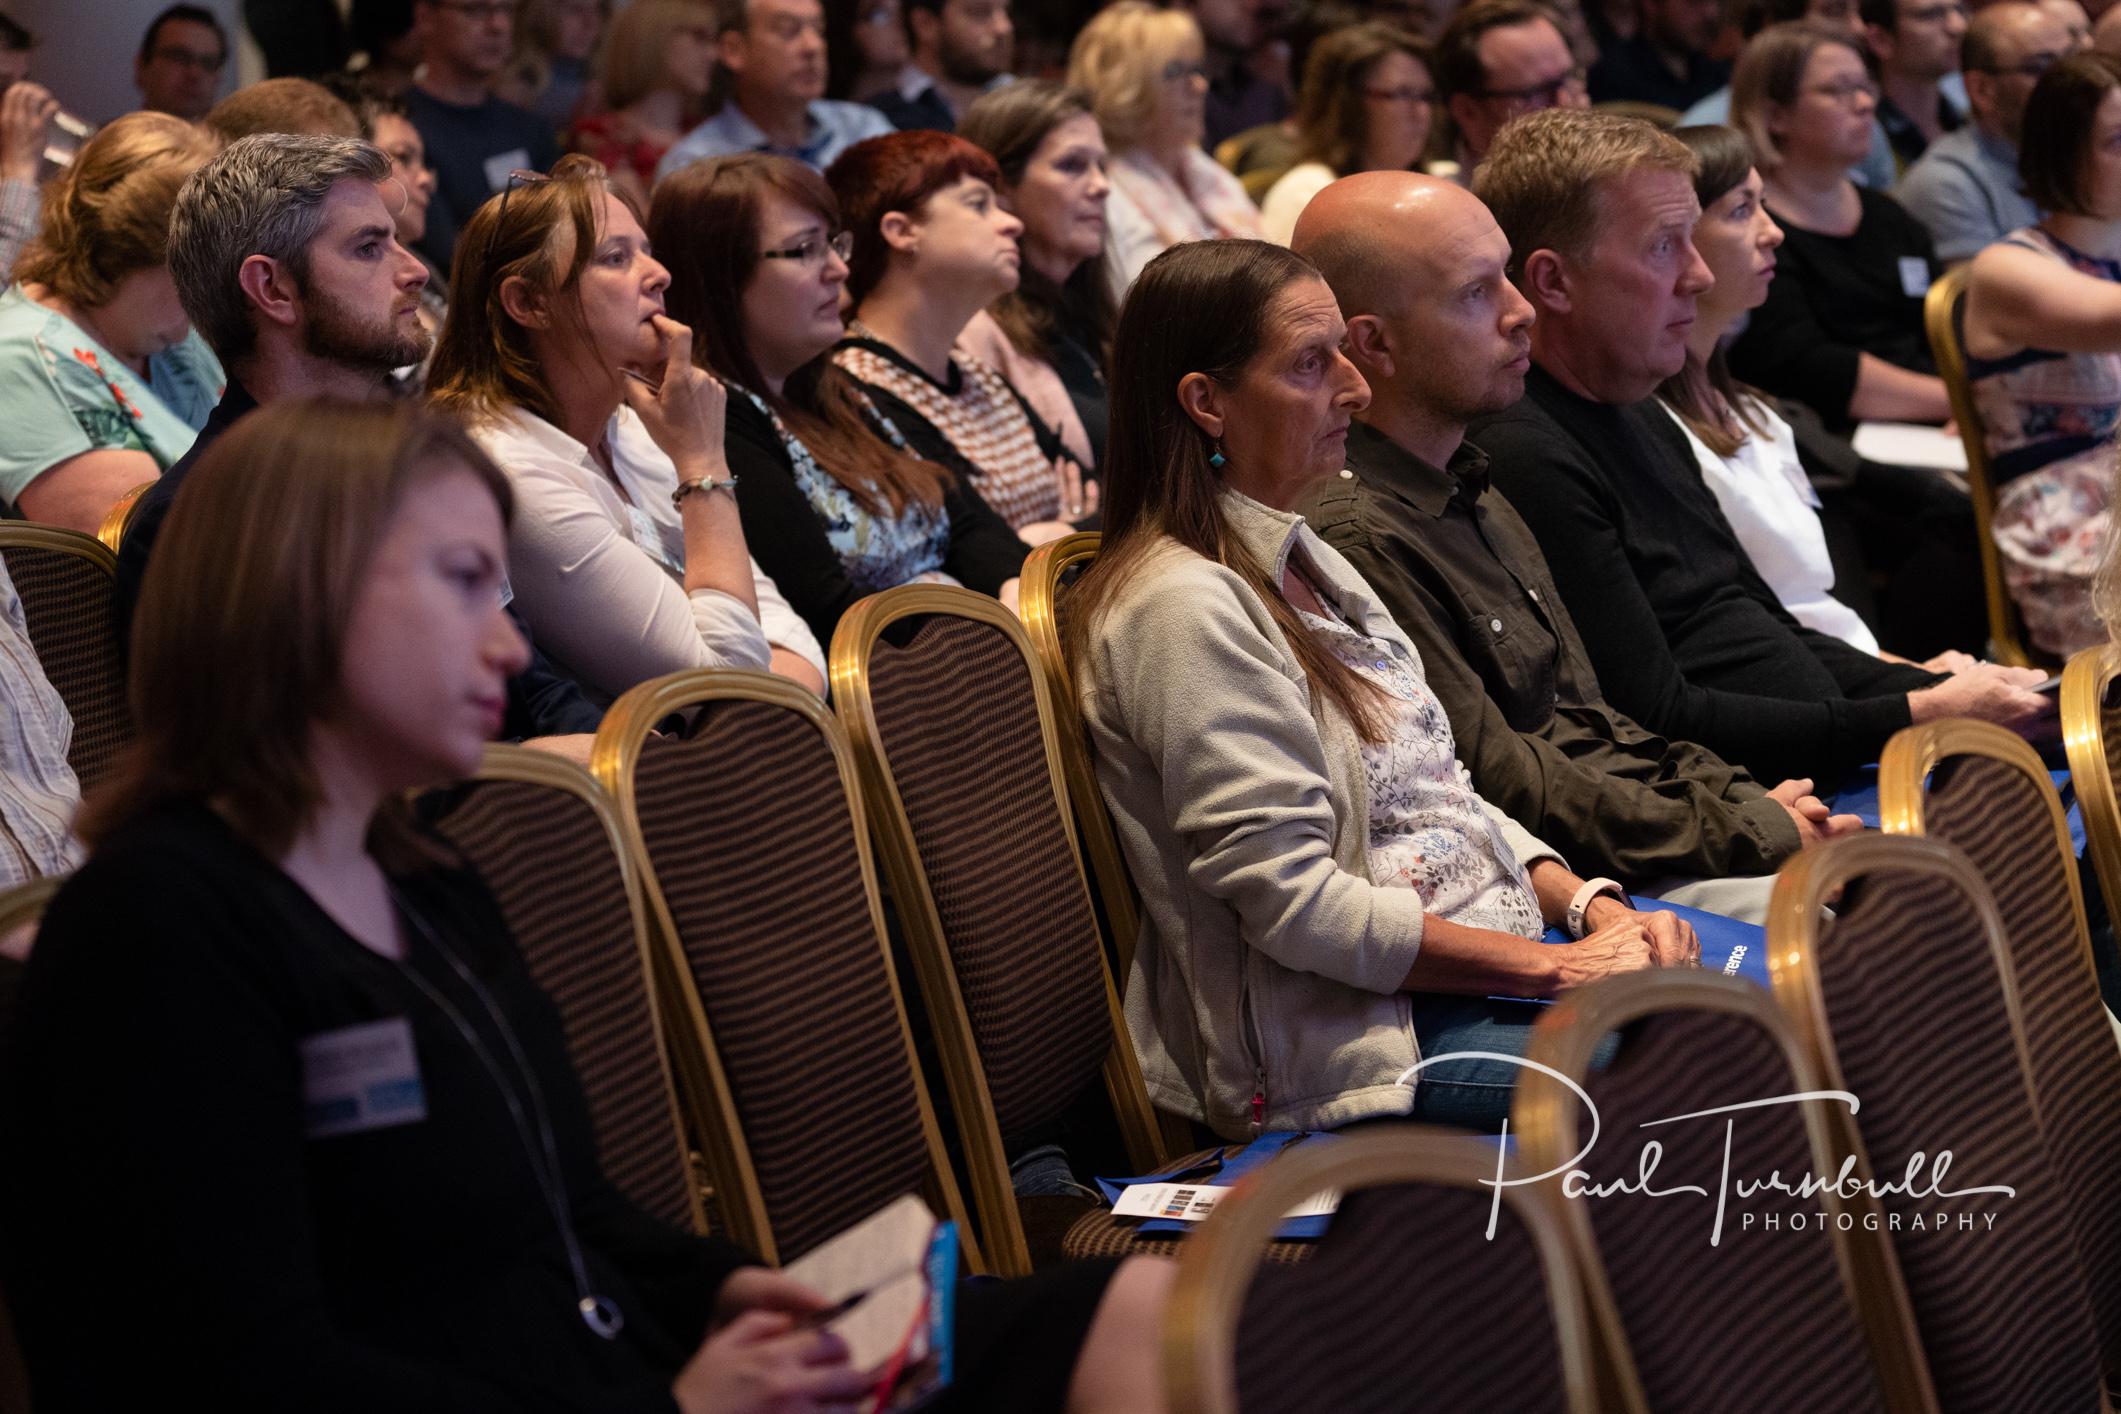 conference-event-photographer-queens-hotel-leeds-yorkshire-039.jpg